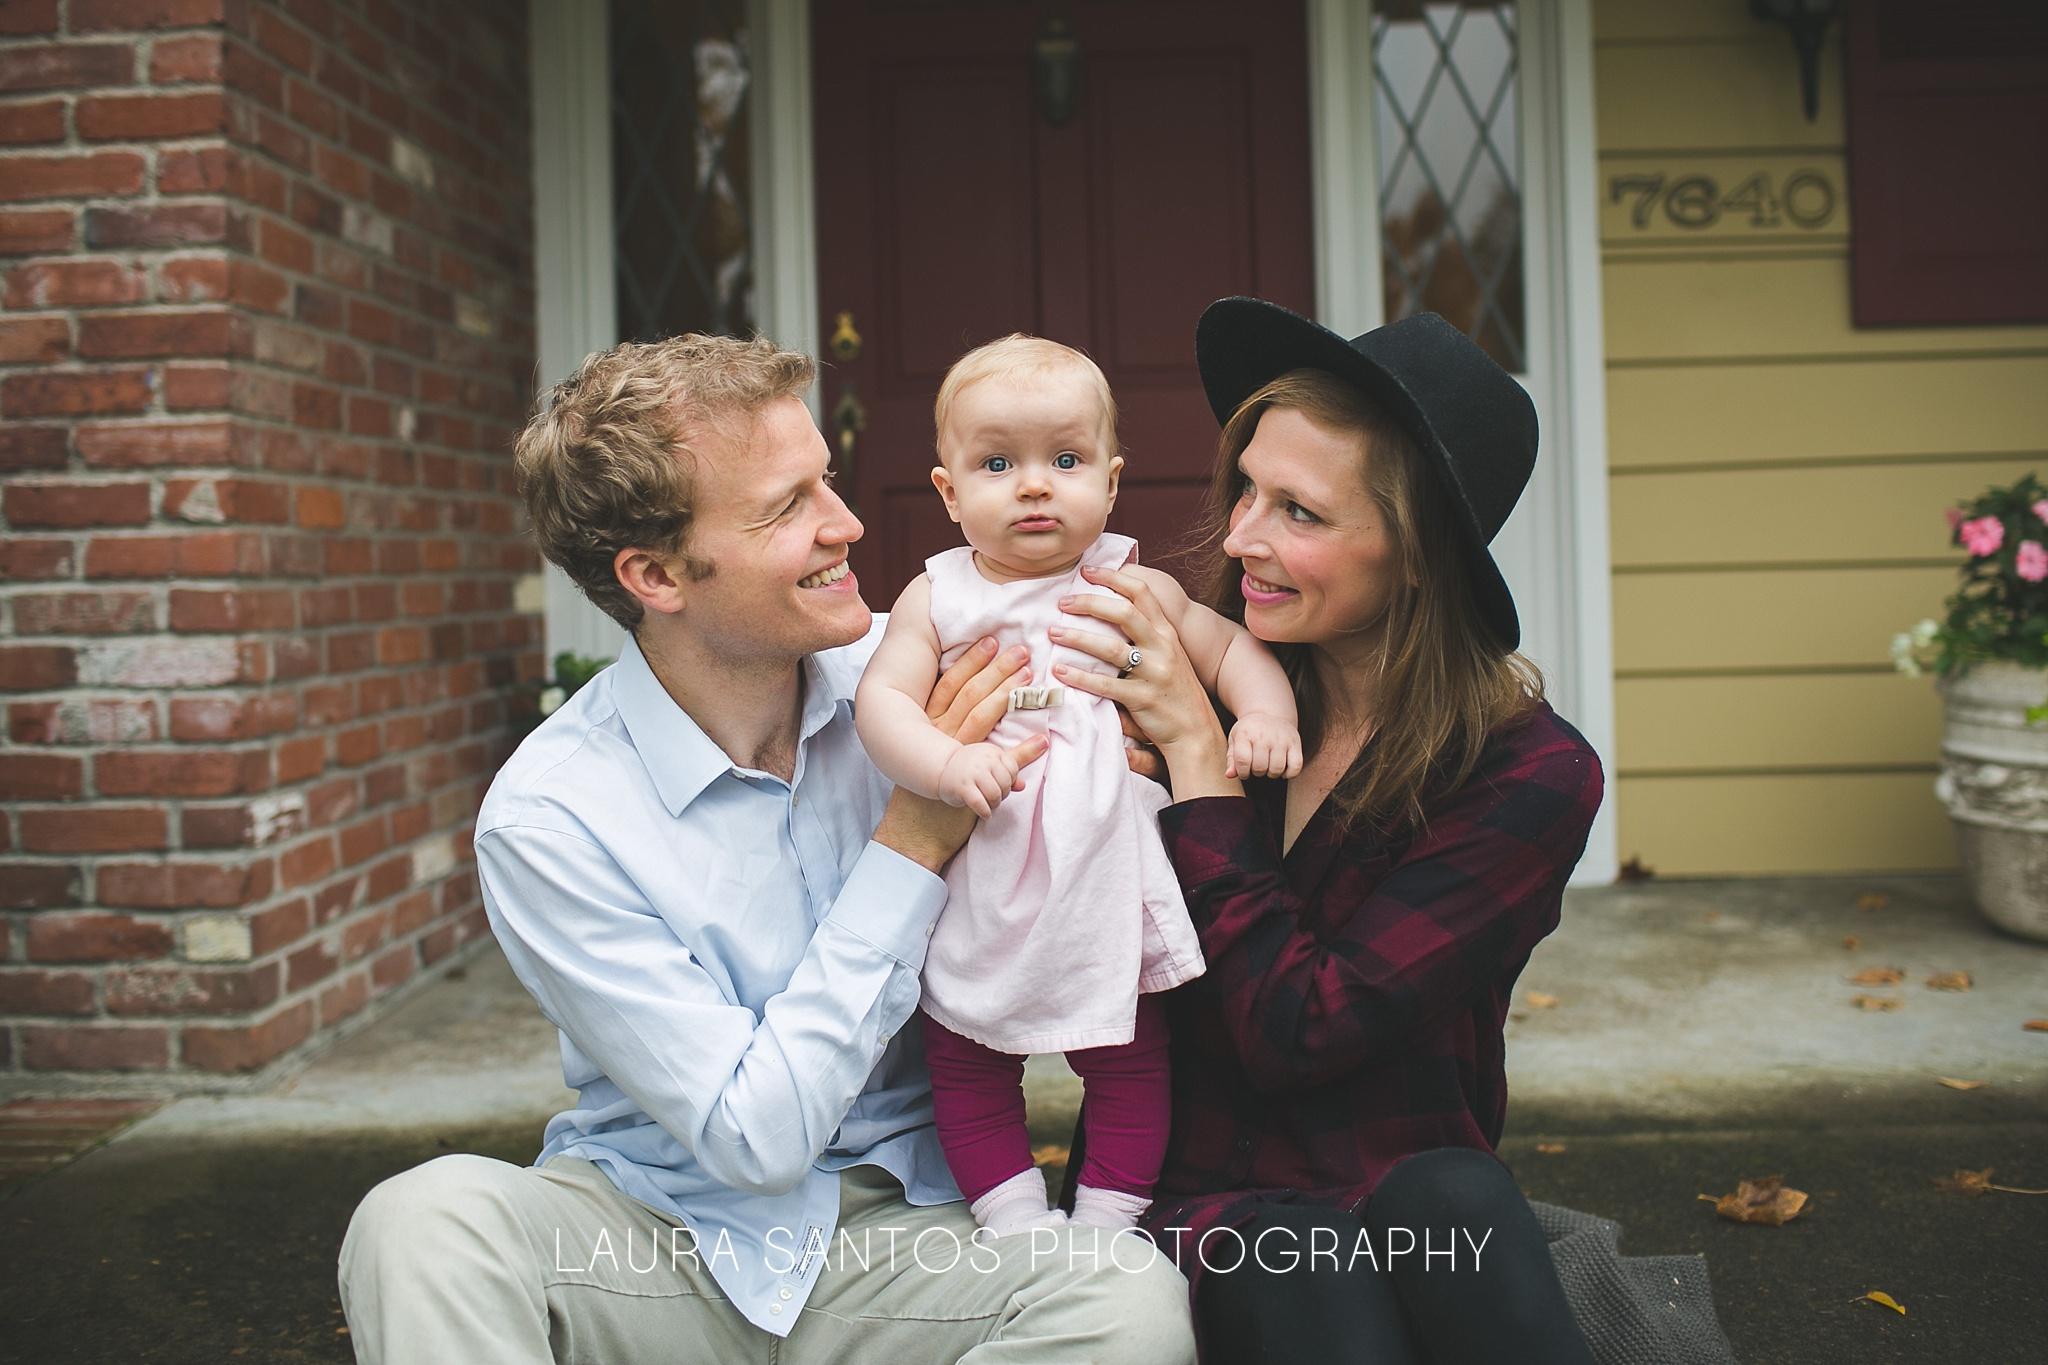 Laura Santos Photography Portland Oregon Family Photographer_0205.jpg